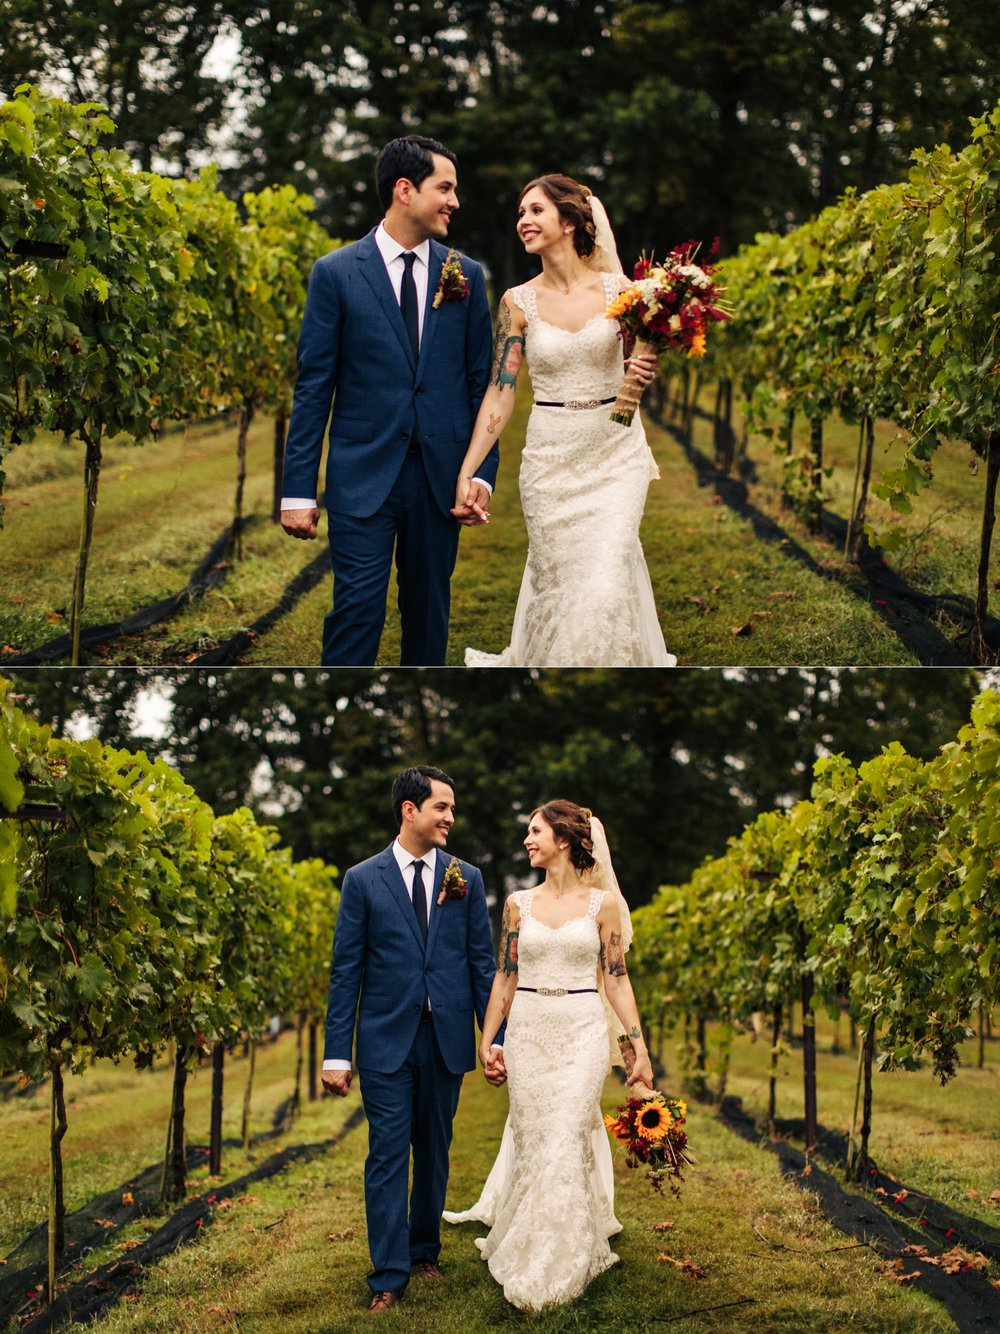 CK-Photo-arrington-wedding_0021.jpg